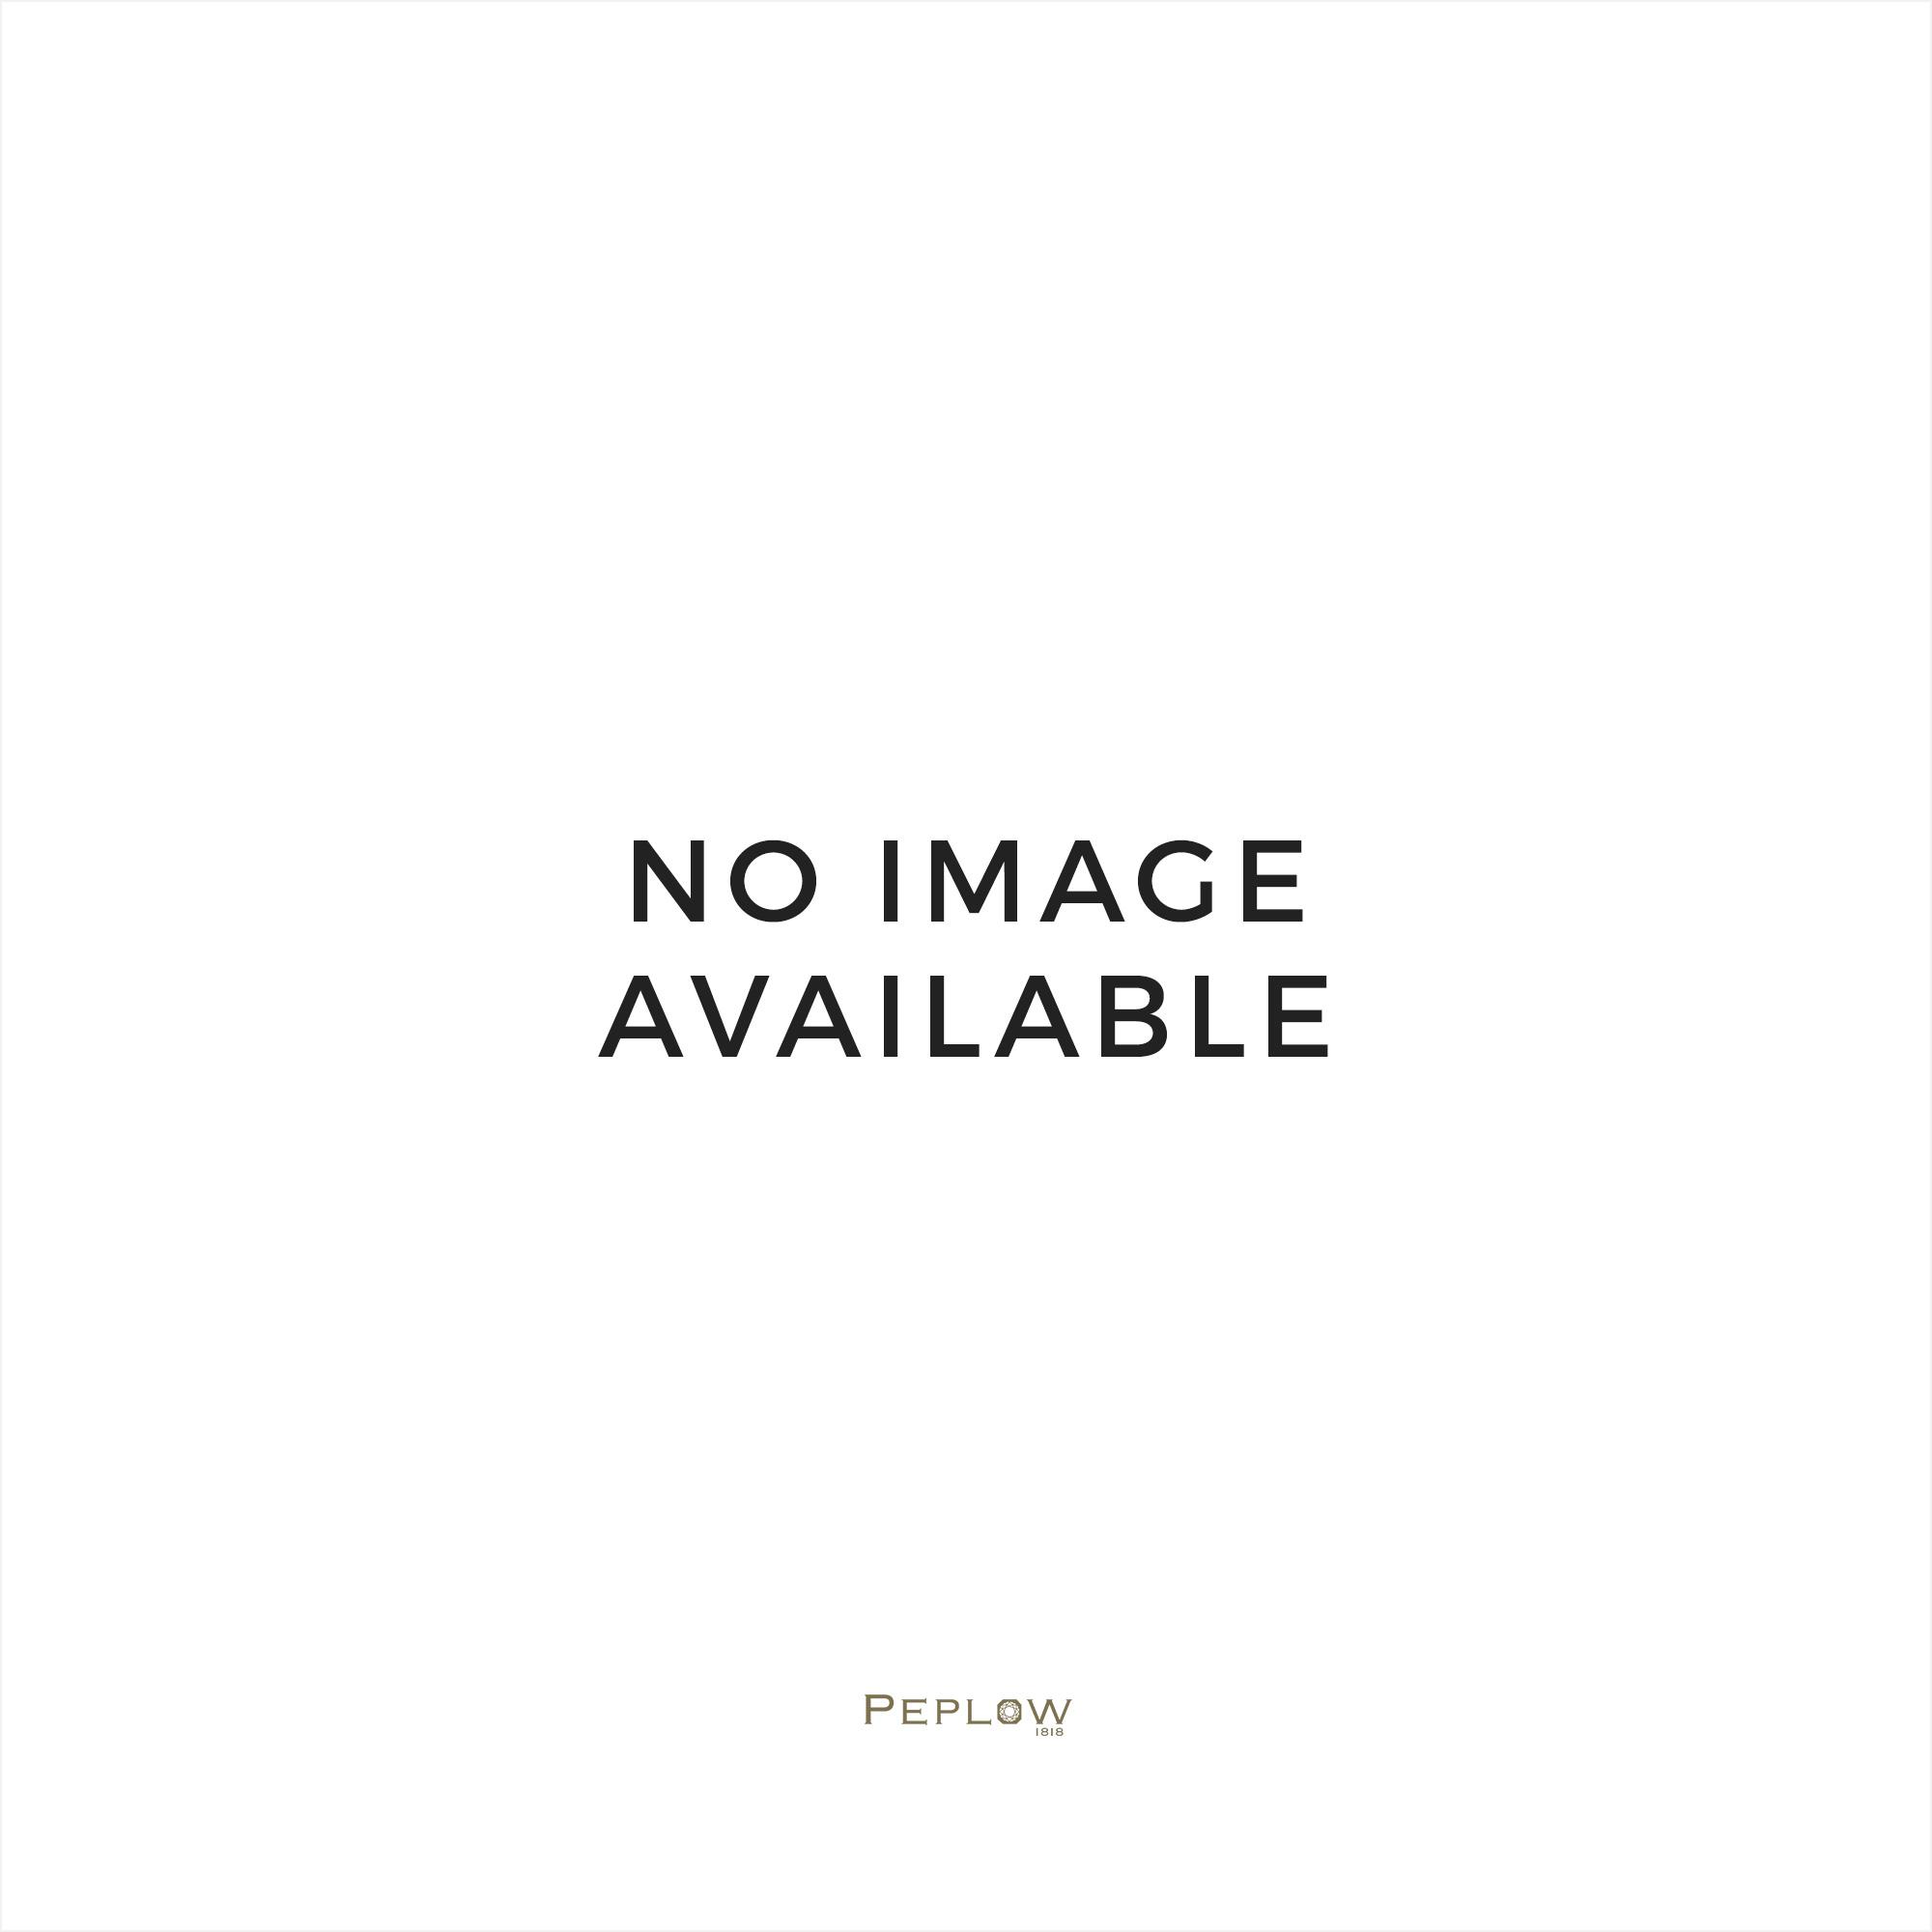 Chidrens time teacher model with football logo. RG247KX9